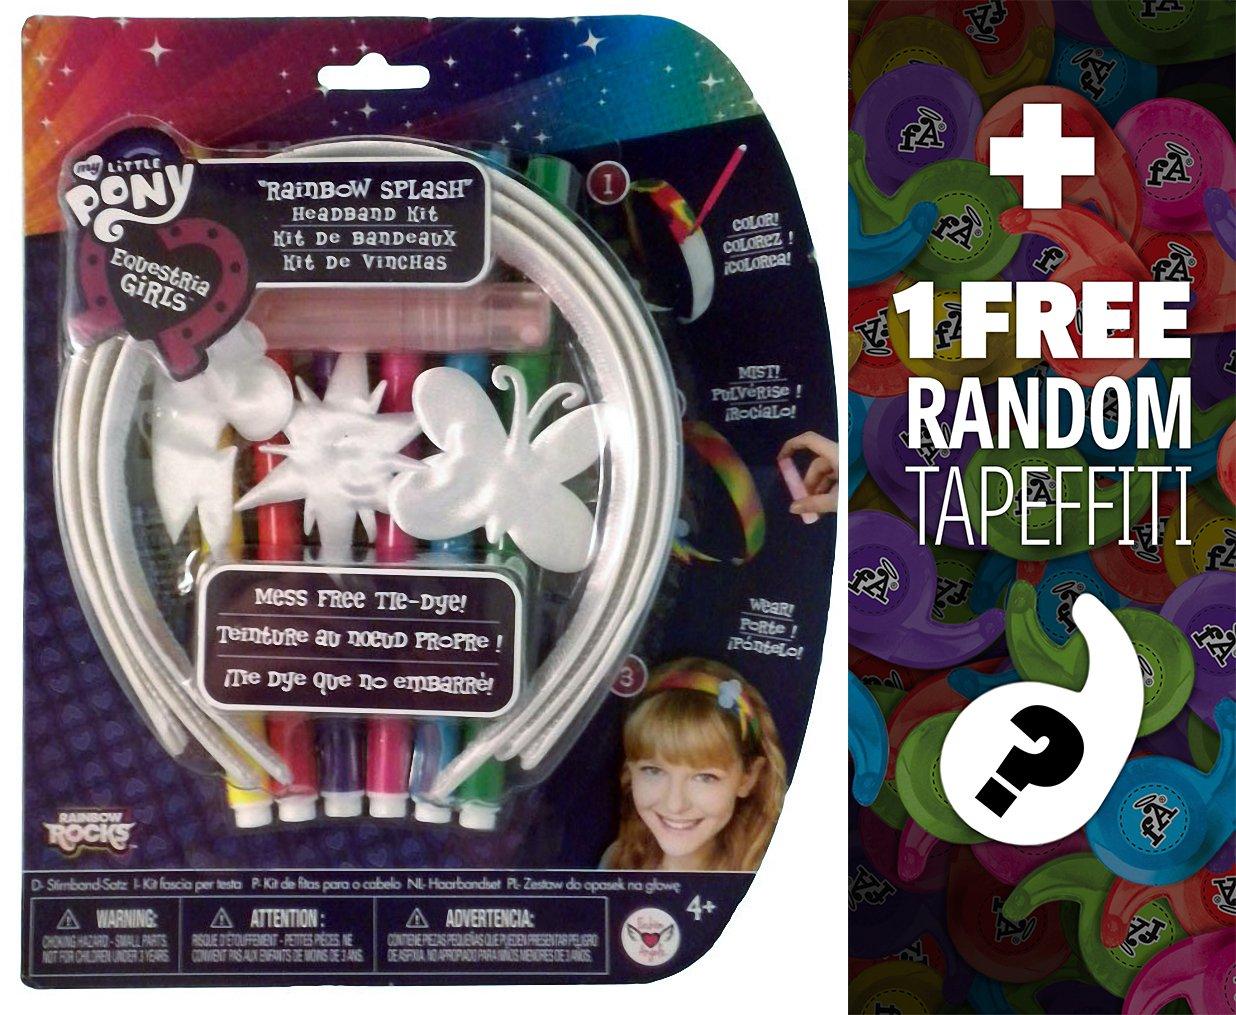 Rainbow Splash Headbands Decorate Your Own Kit: My Little Pony Equestria Girls Series + 1 FREE Mini-Tapeffiti Bundle